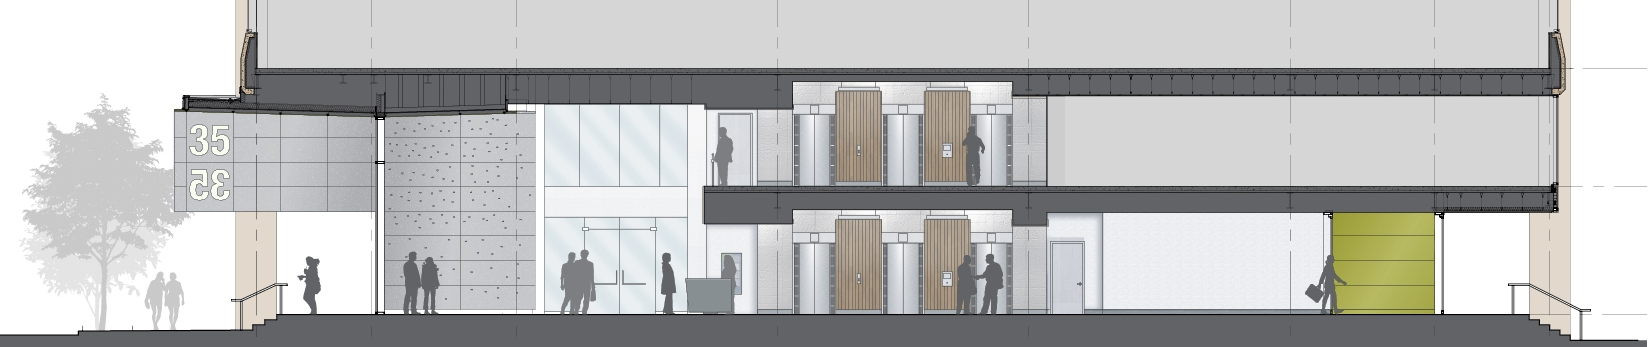 Cross-Section through lobby